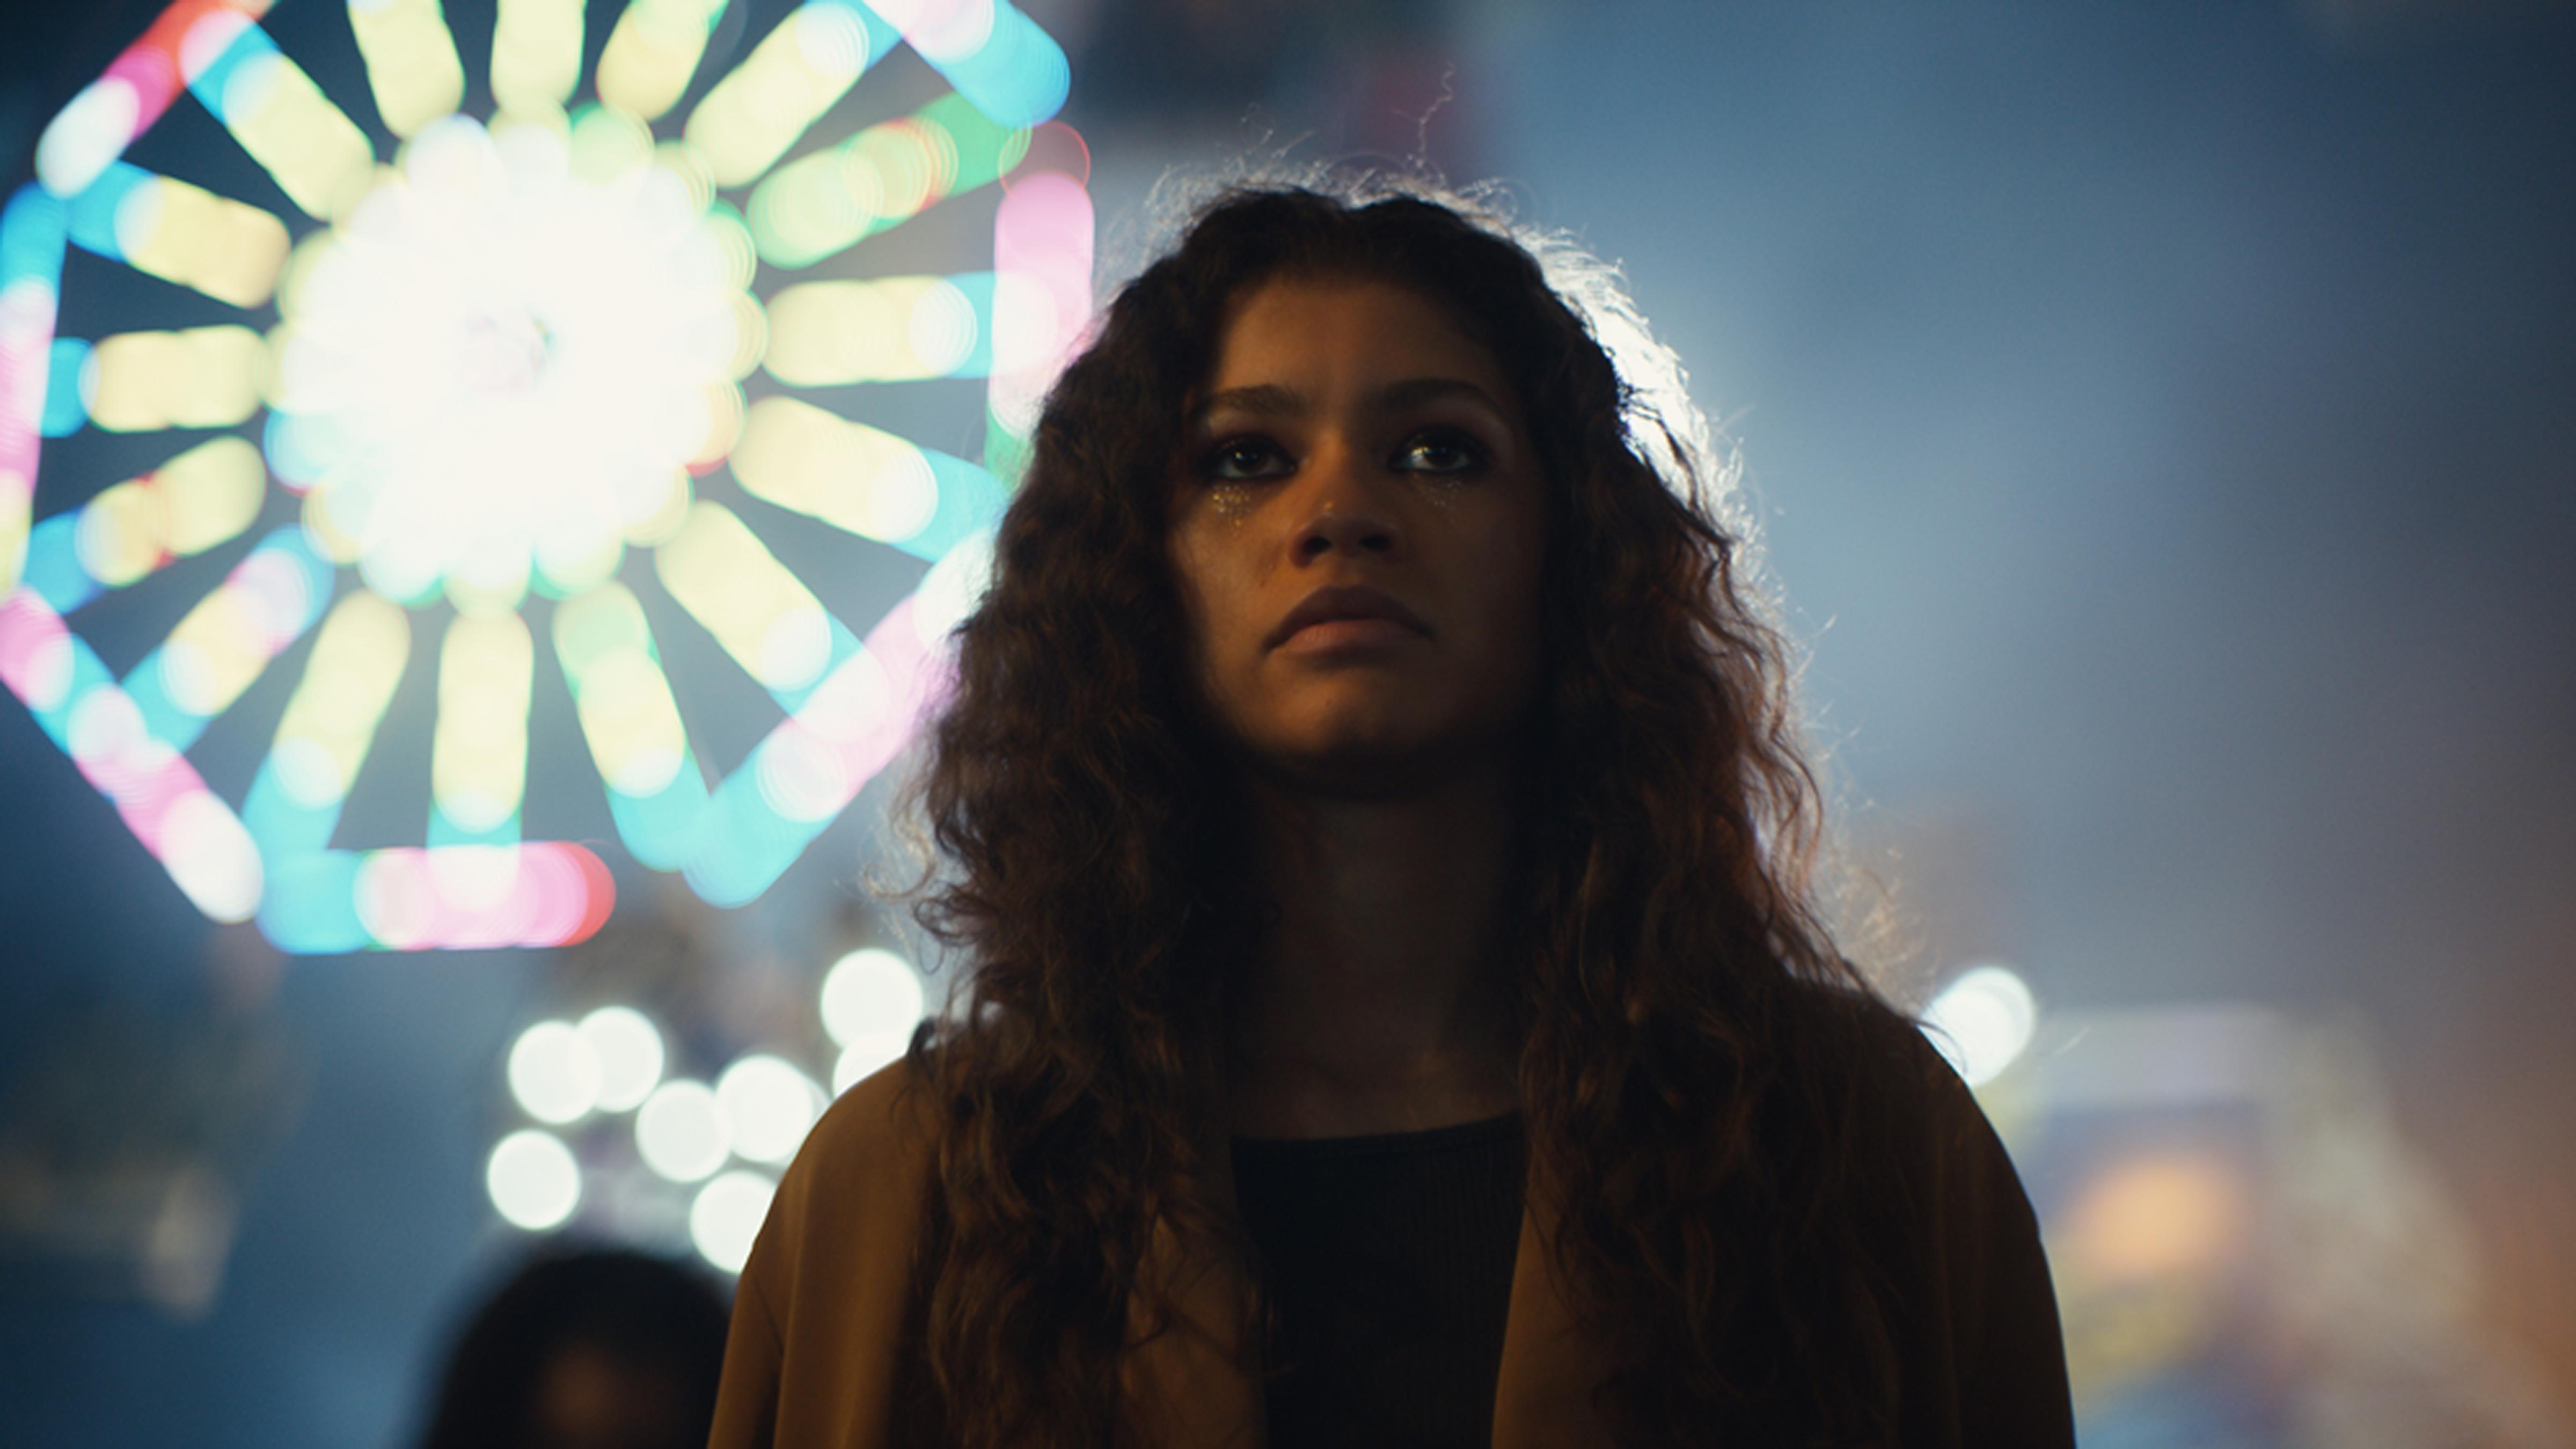 HBO renovó Euphoria para una segunda temporada - Radio Cantilo